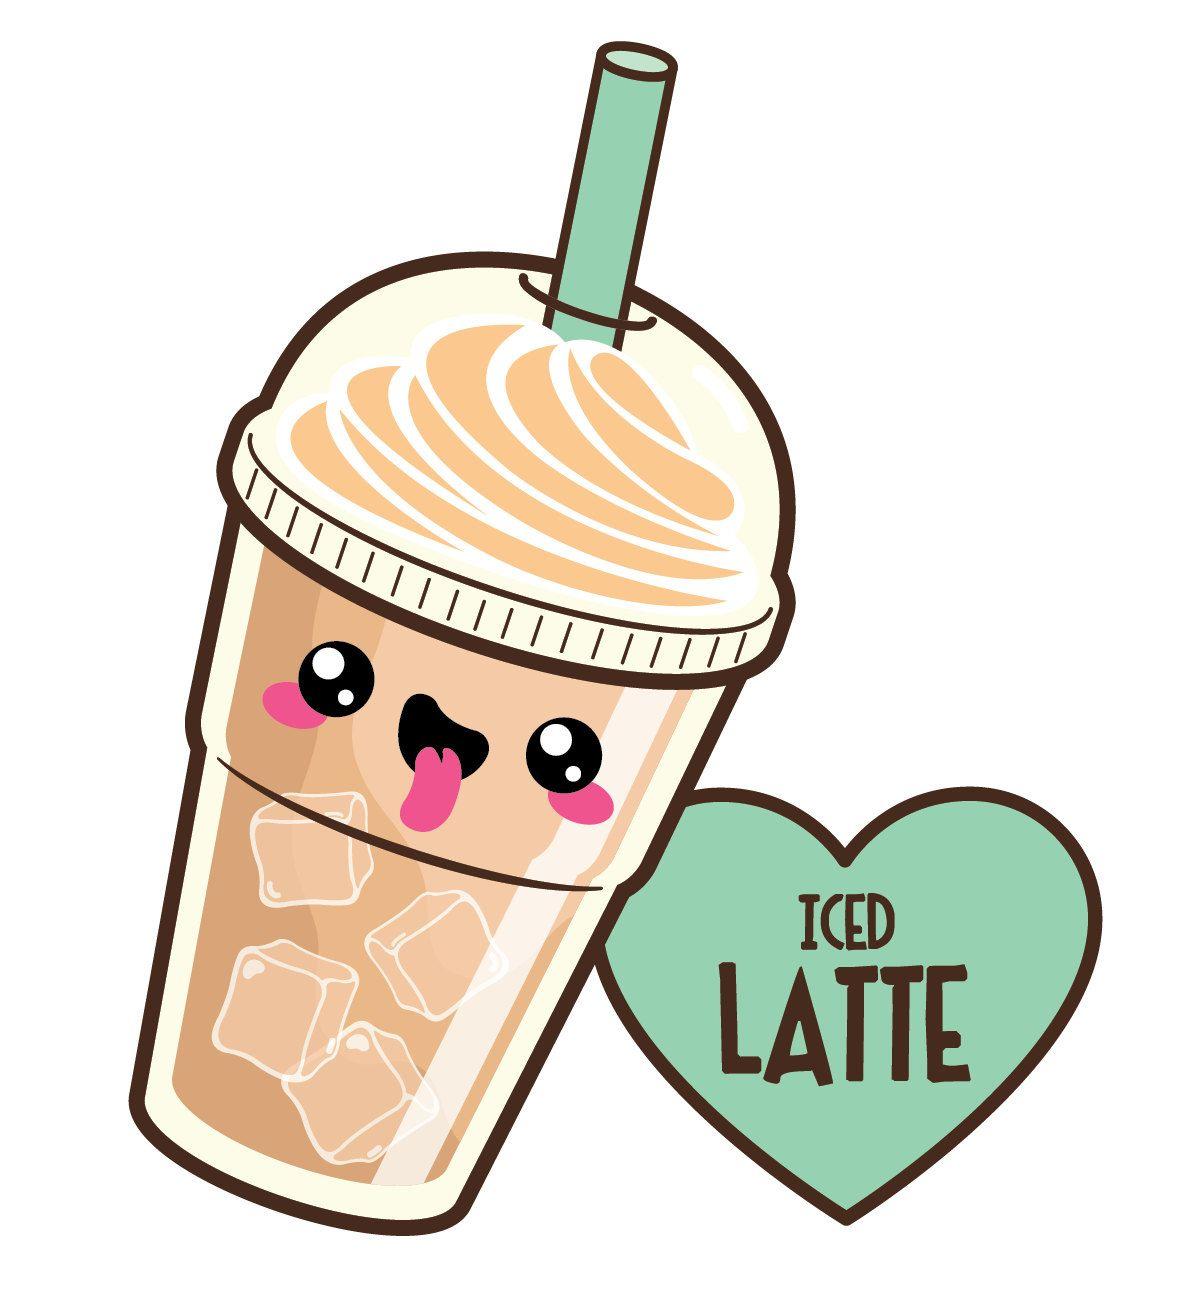 Coffee clipart, kawaii coffee clipart, cute coffee clipart, kawaii.